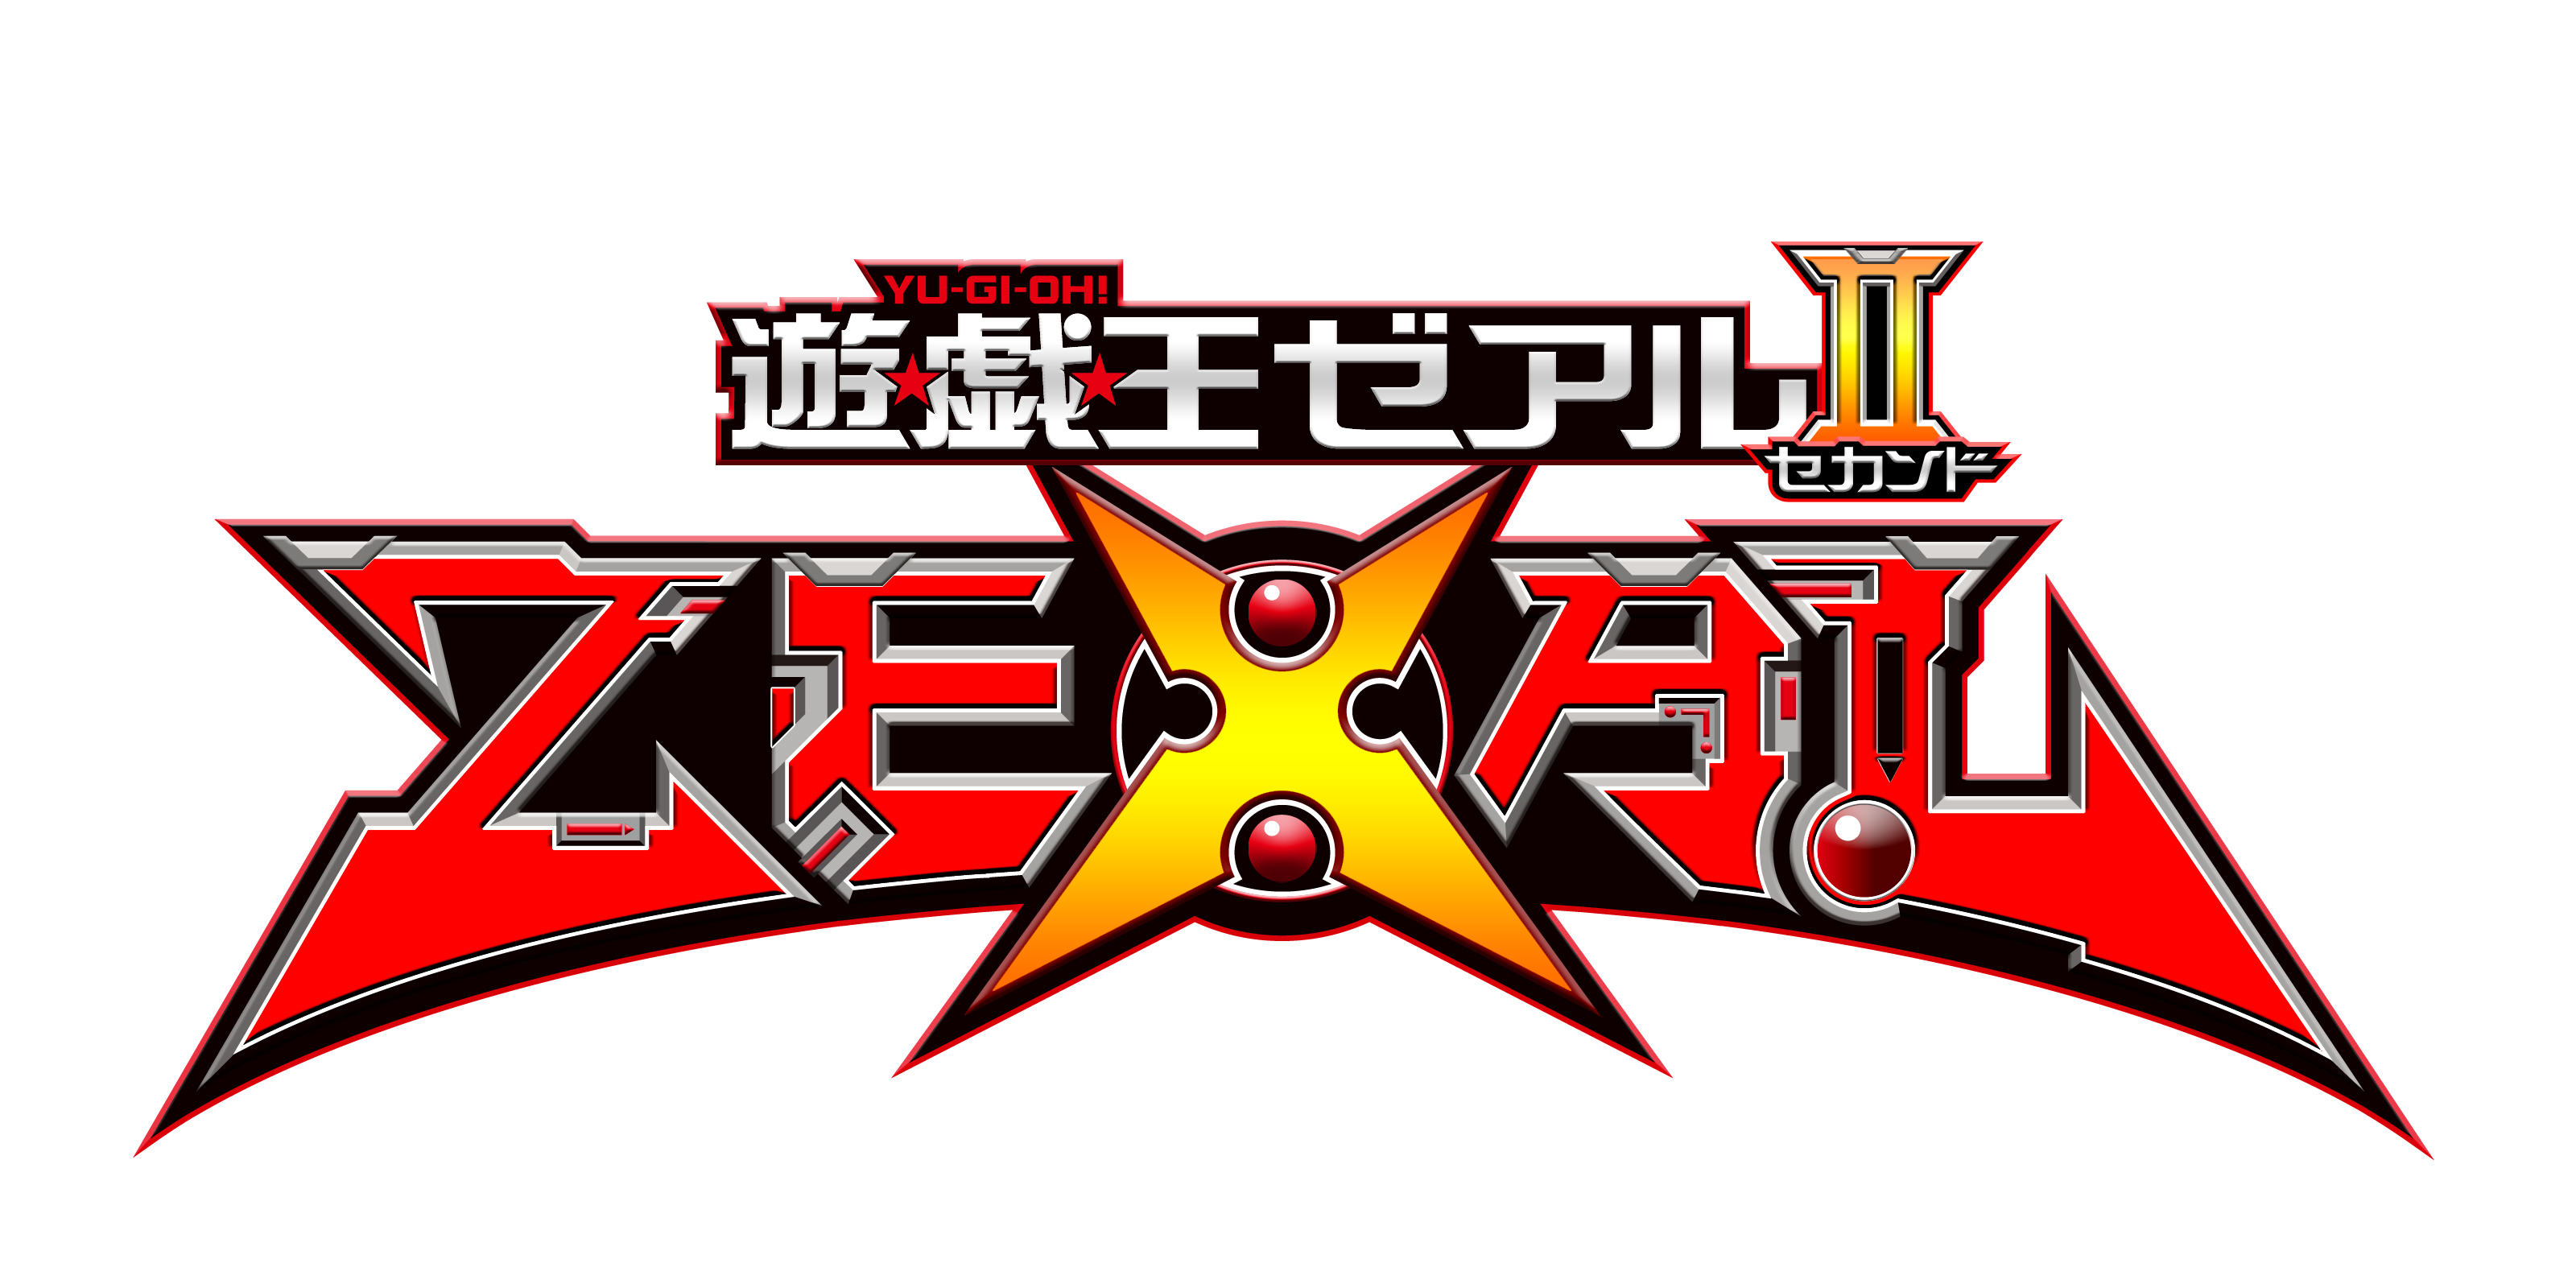 Yu Gi Oh Zexal Logo Japan 2 Japan Logo Japanese Logo Anime Wallpaper